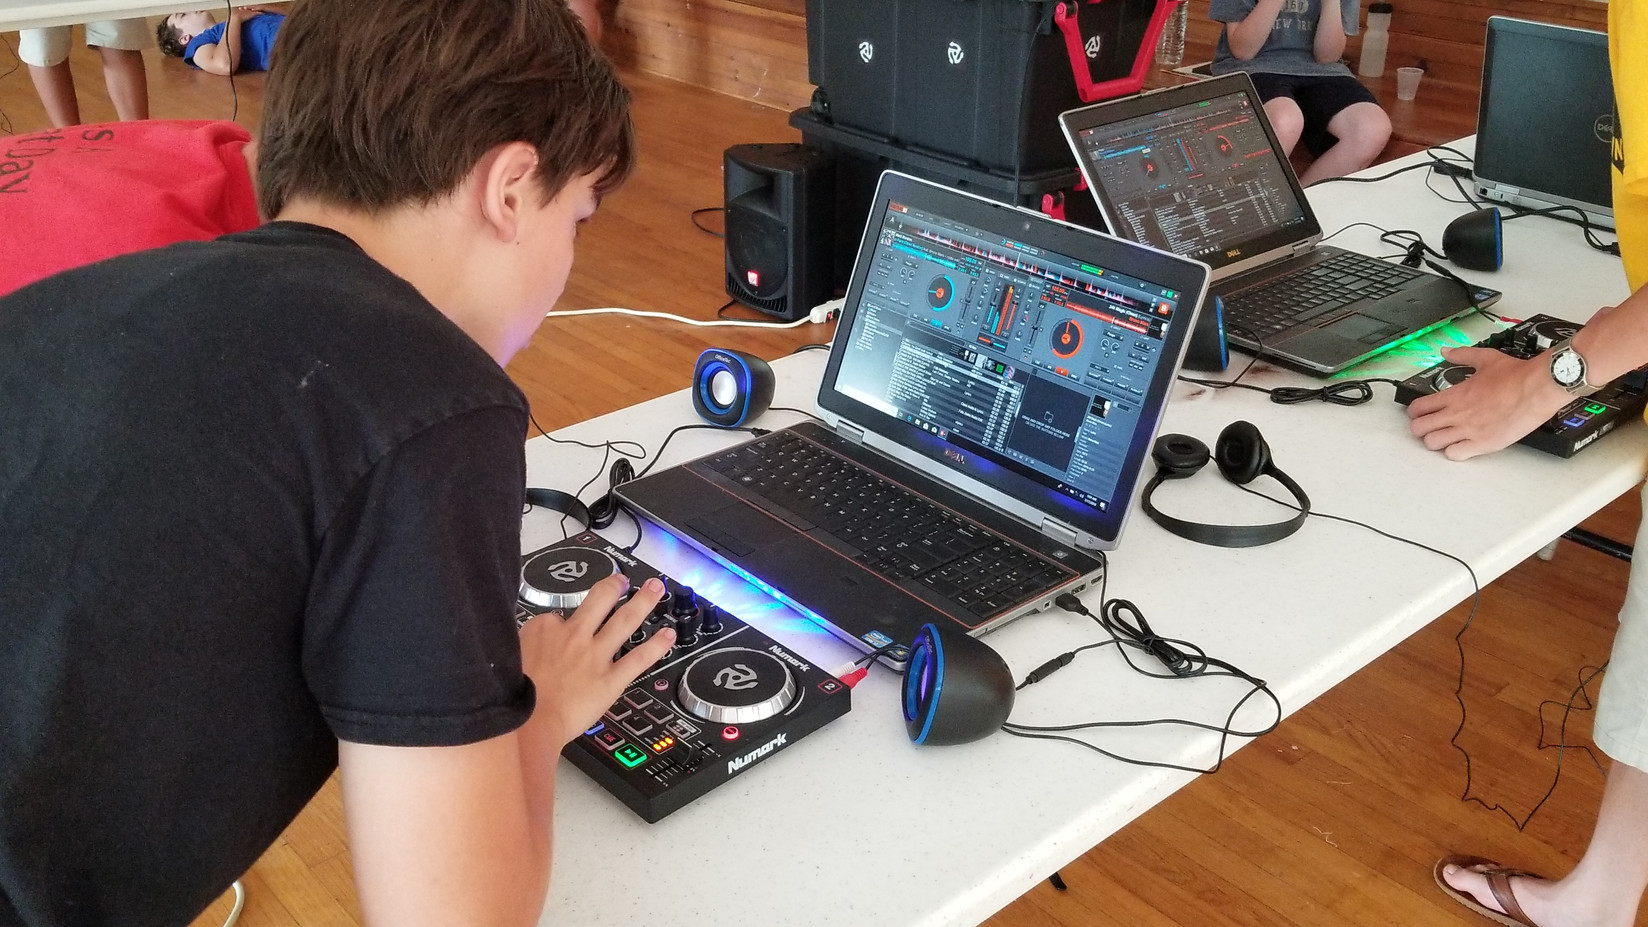 Dj-Workshop-For-Teens.jpg